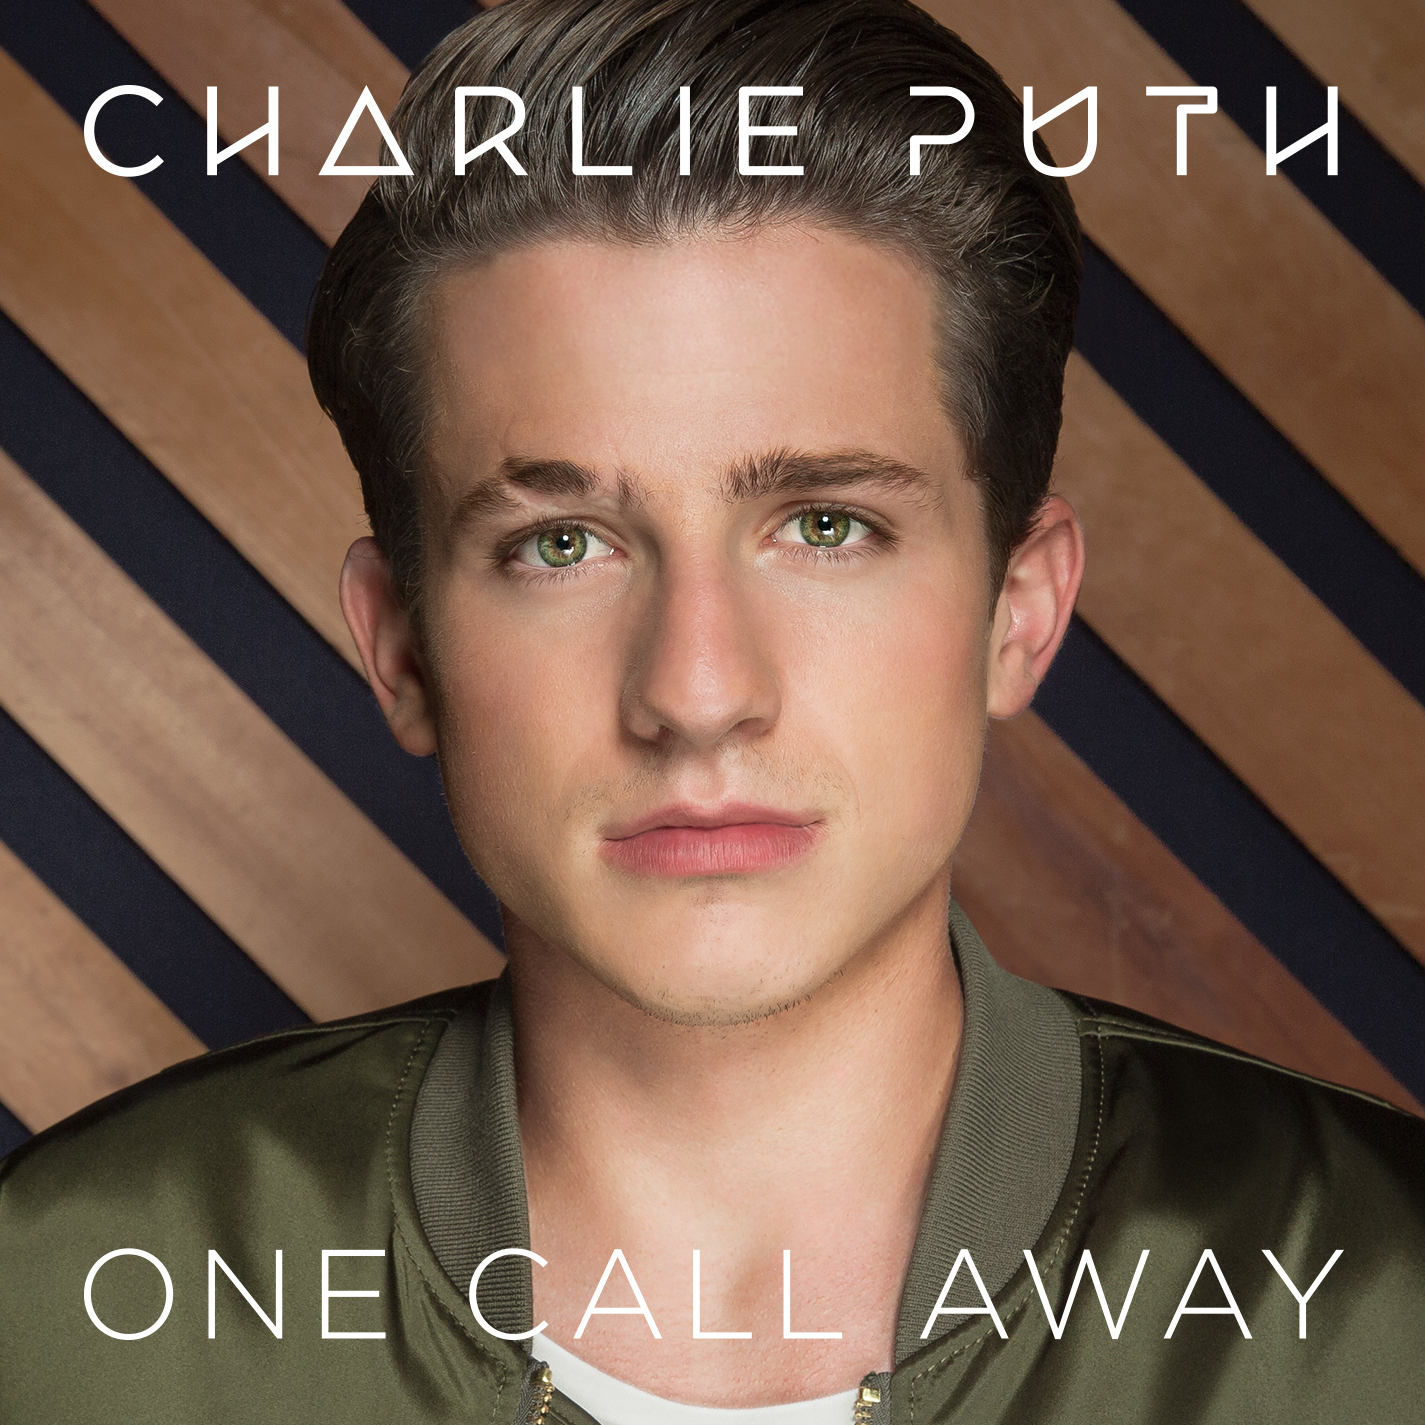 Charlie Puth - One Call Away ft. Tyga [Remix] - YouTube